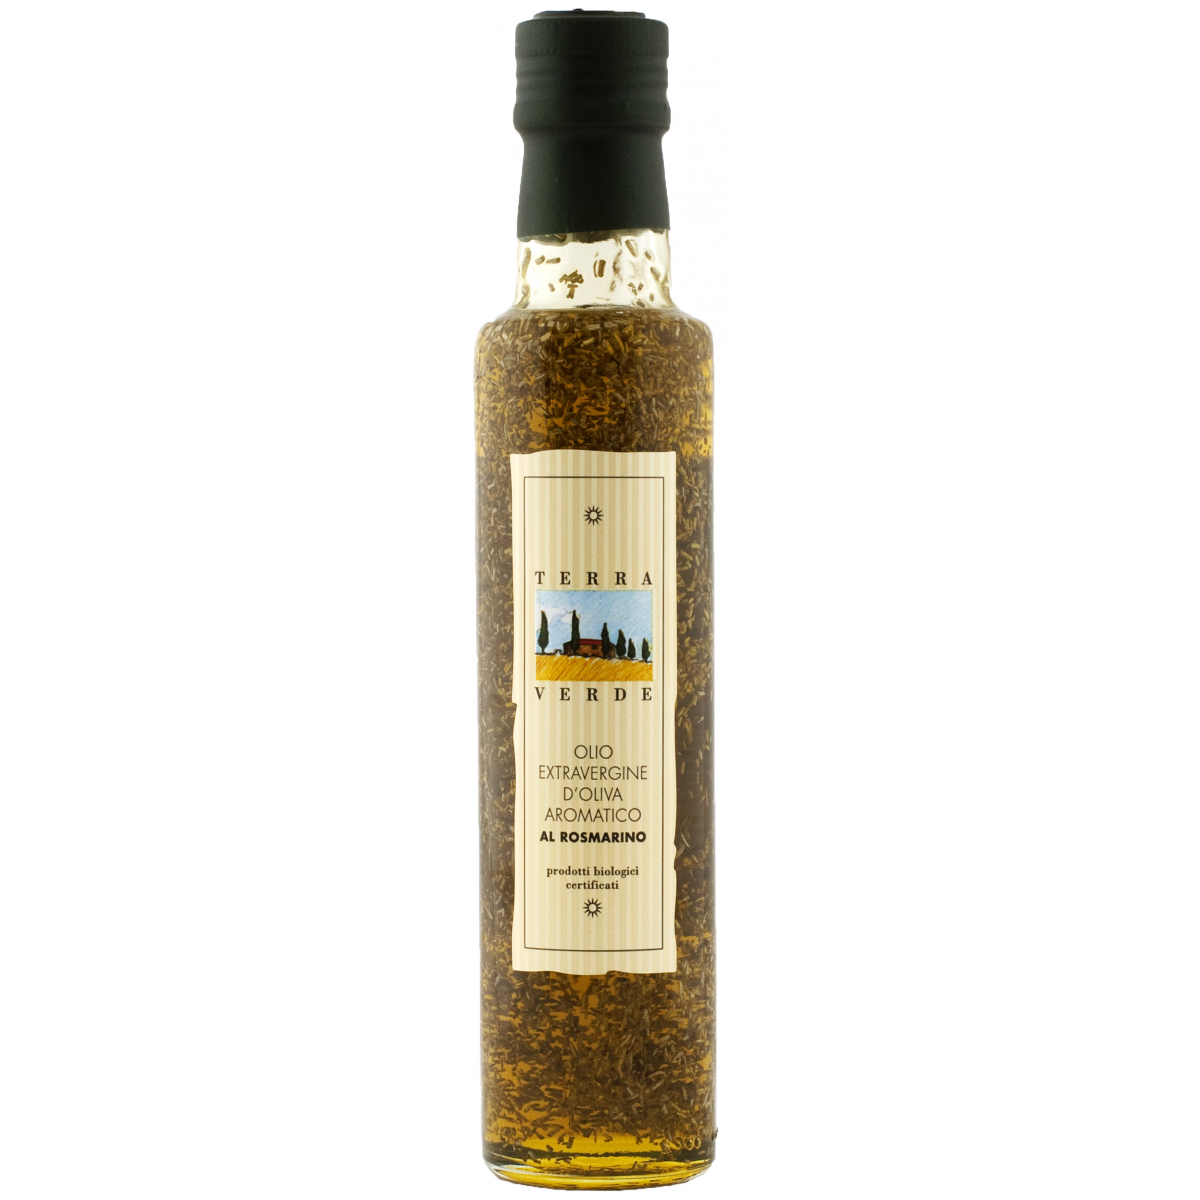 Olio d Oliva extra vergine al Rosmarino